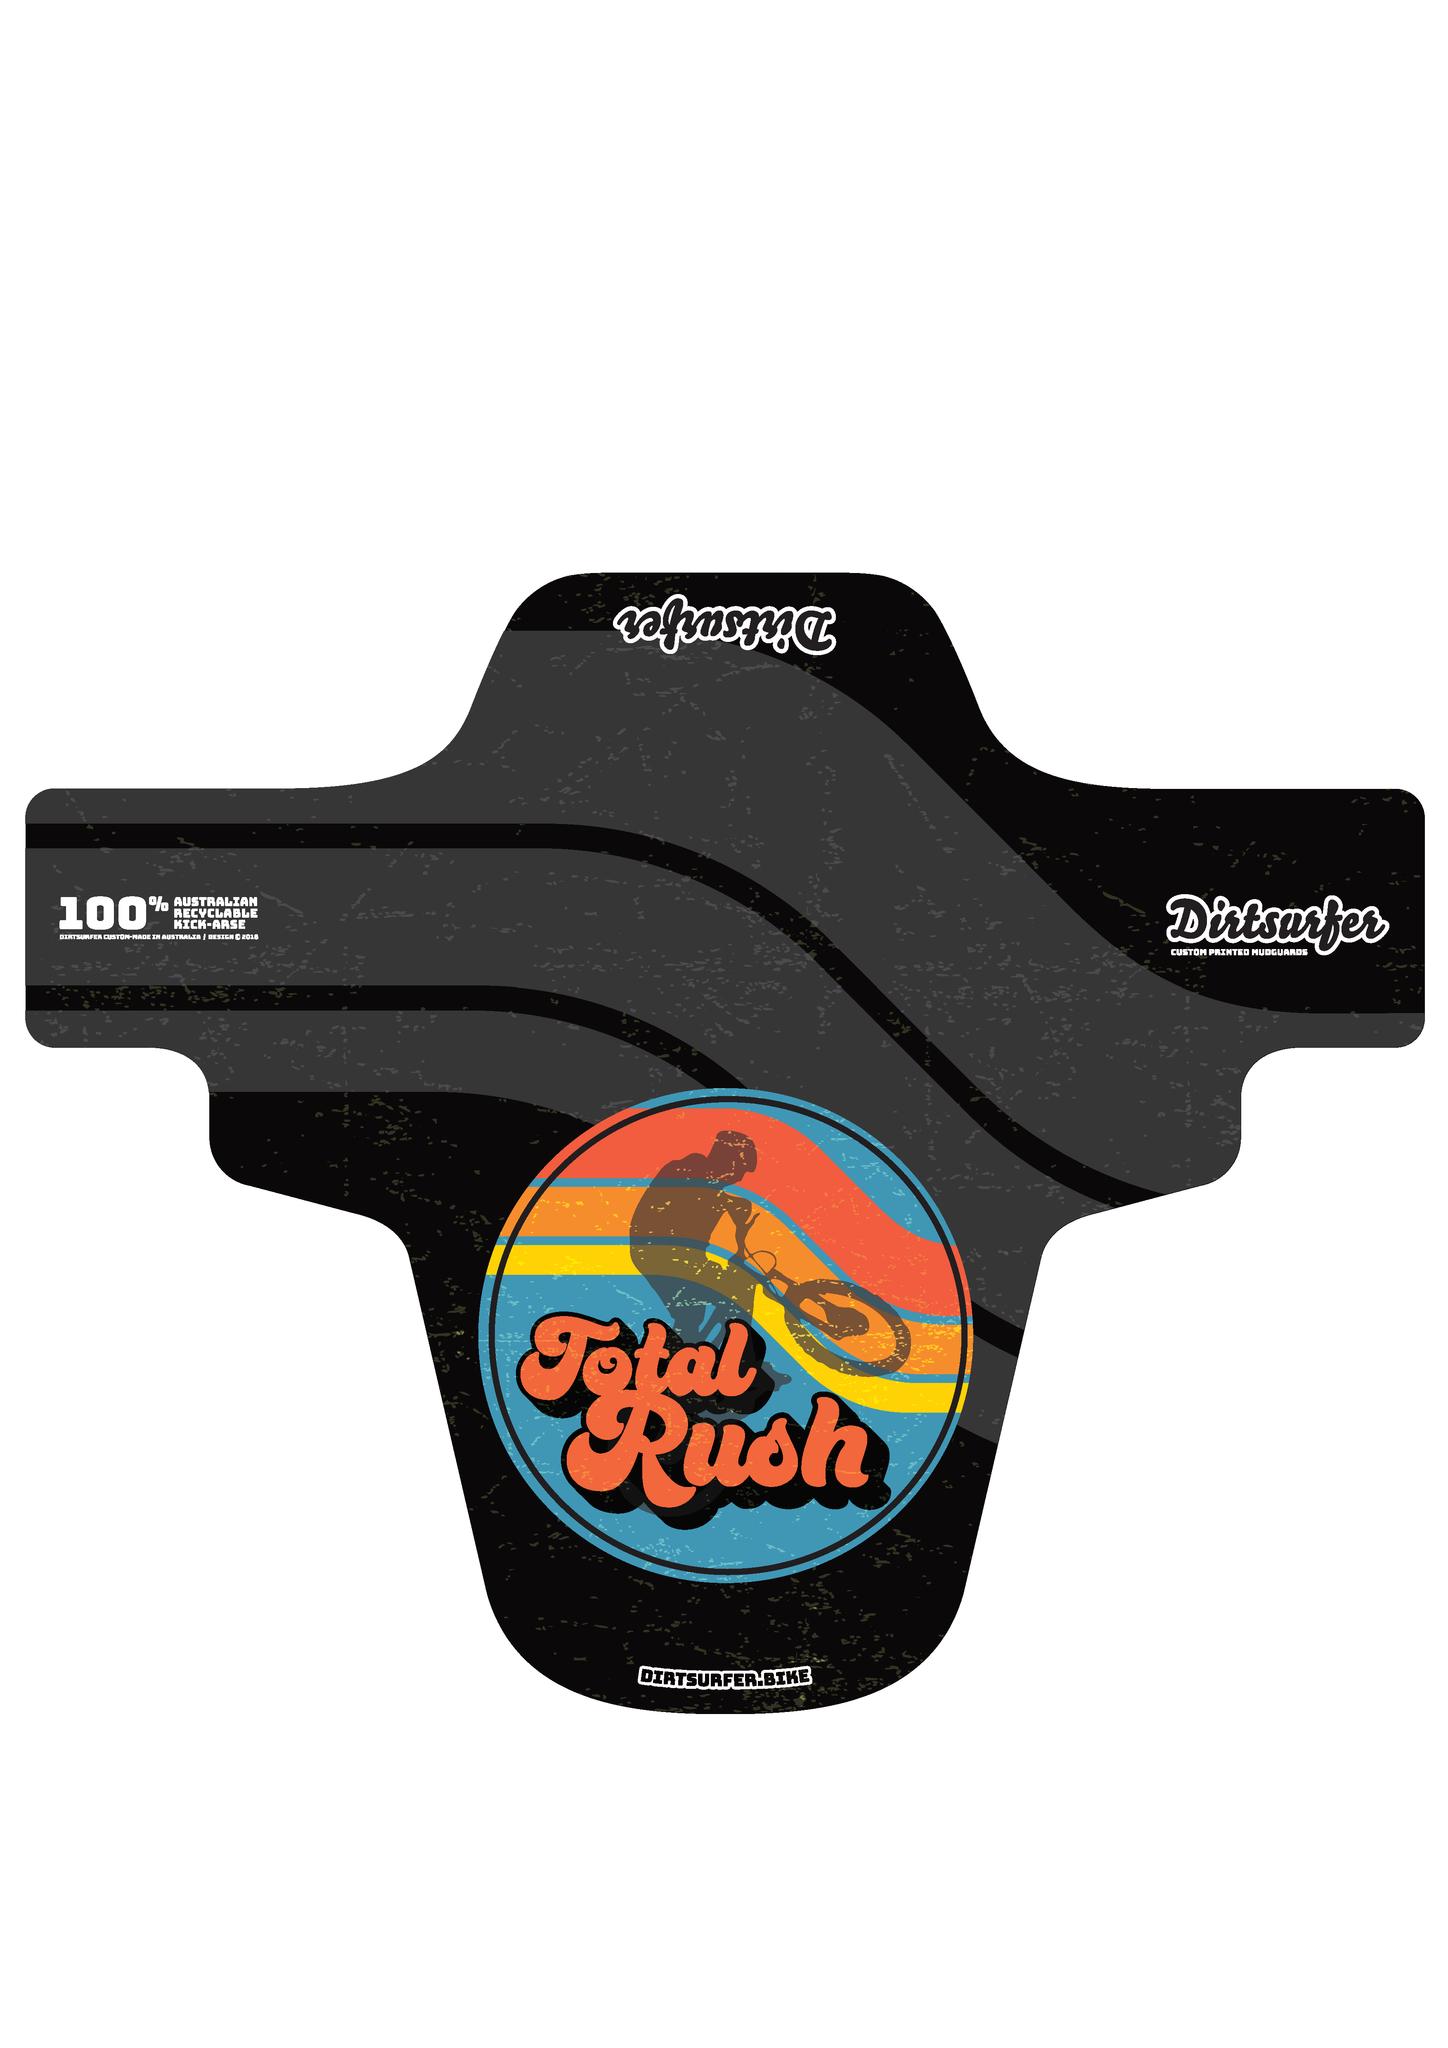 Total Rush Mudguard - Front